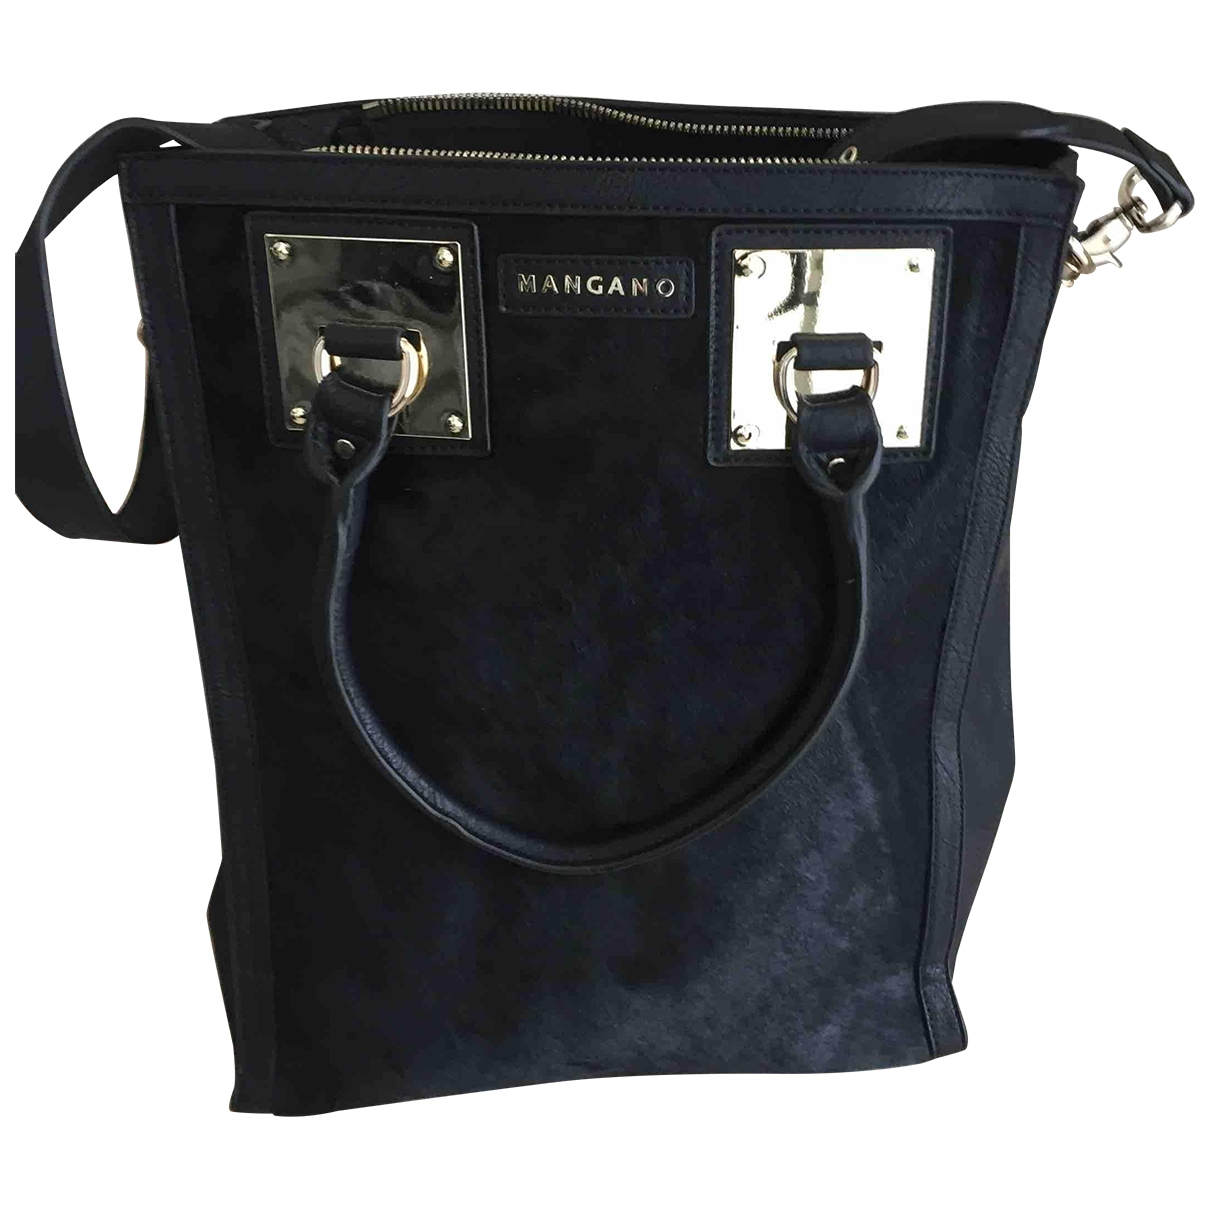 Mangano \N Black Leather handbag for Women \N